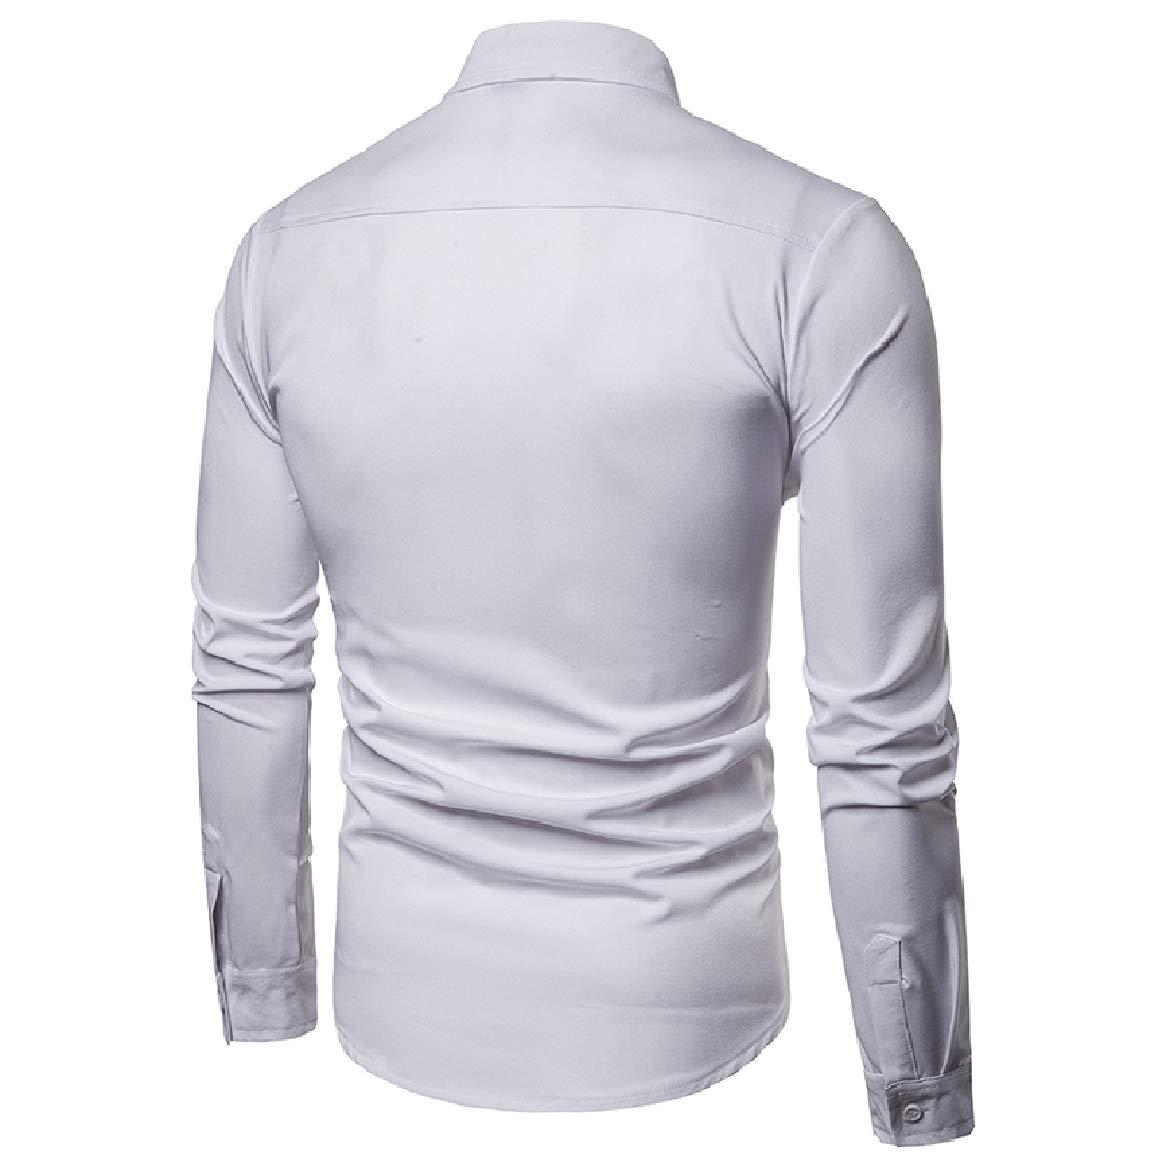 SportsX Mens Lapel Collar Standard-fit Pure Color Bussiness Long-Sleeve Work Shirt